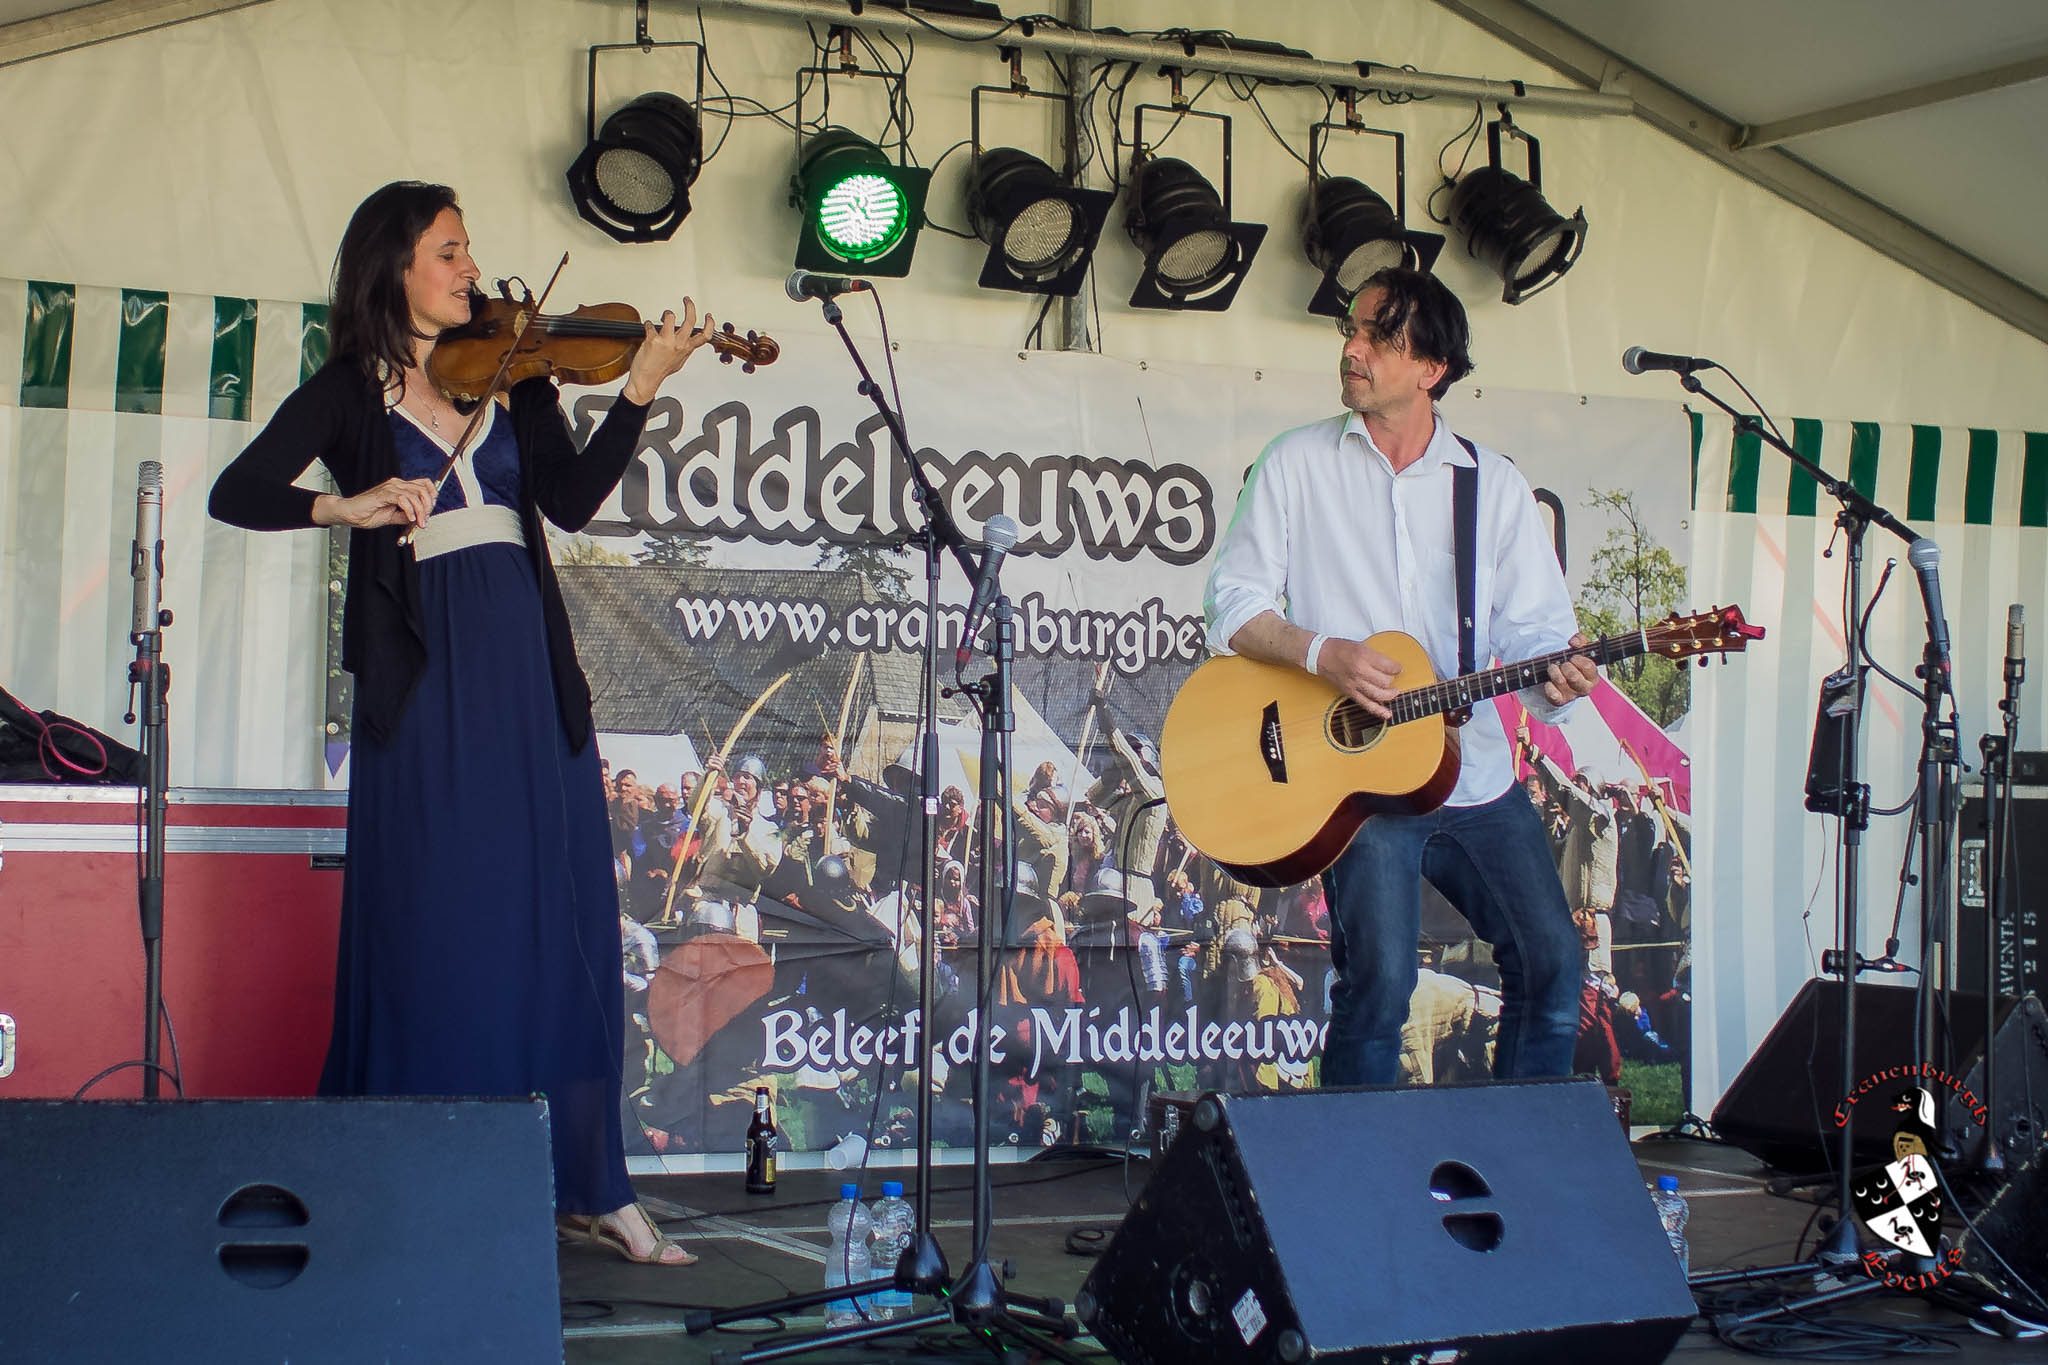 Middeleeuws-Festijn-Cannenburgh-2018-Rodeo-Roses-Ellen-la-Faille-4